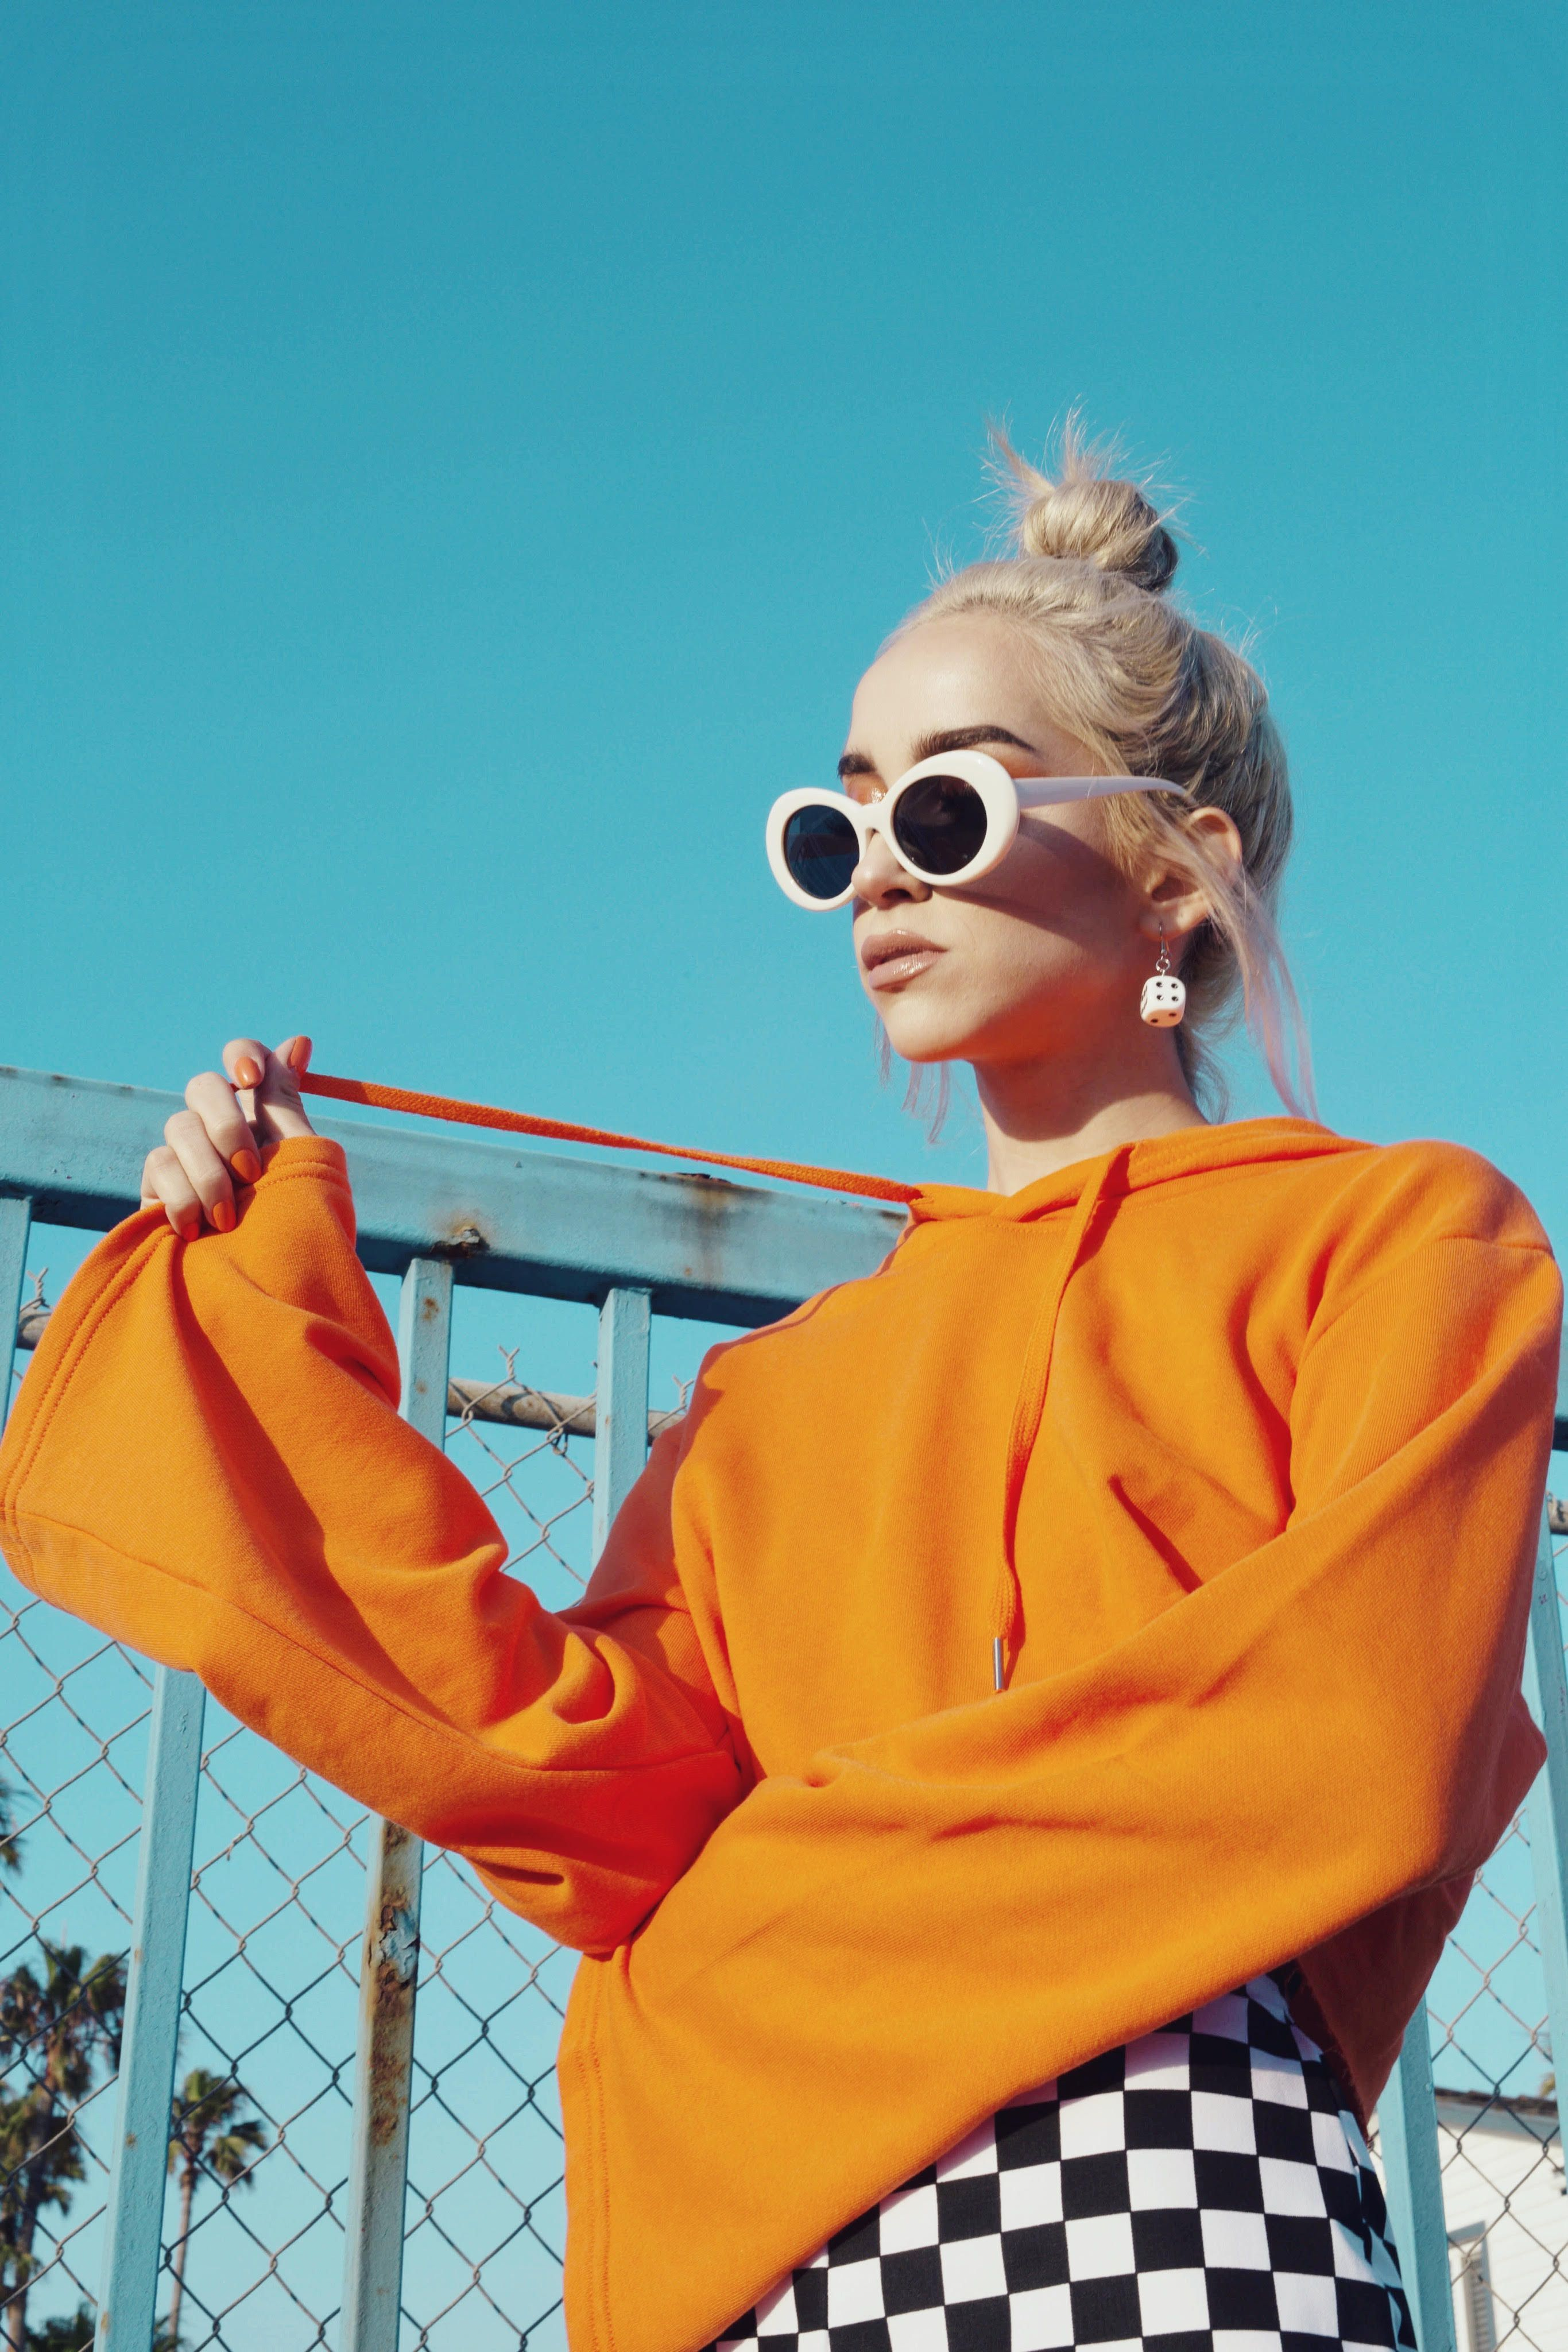 Oversize Retro Tapered Arms Oval Sunglasses Creativeportraitphotography Fashion Fashion Photography Vintage Fashion